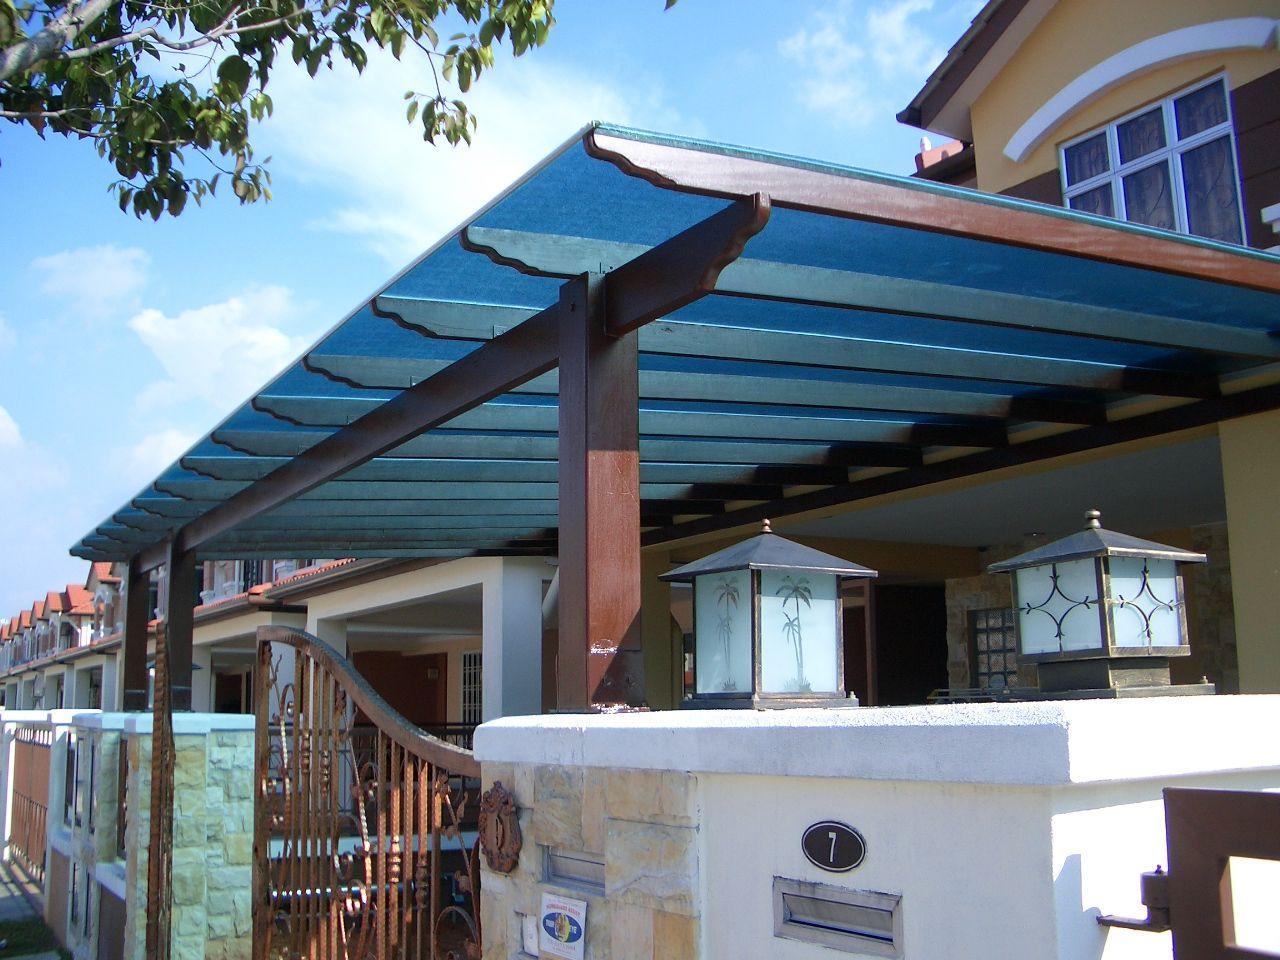 Berjaya polycarbonate awning pergolas pinterest for Roof awning design